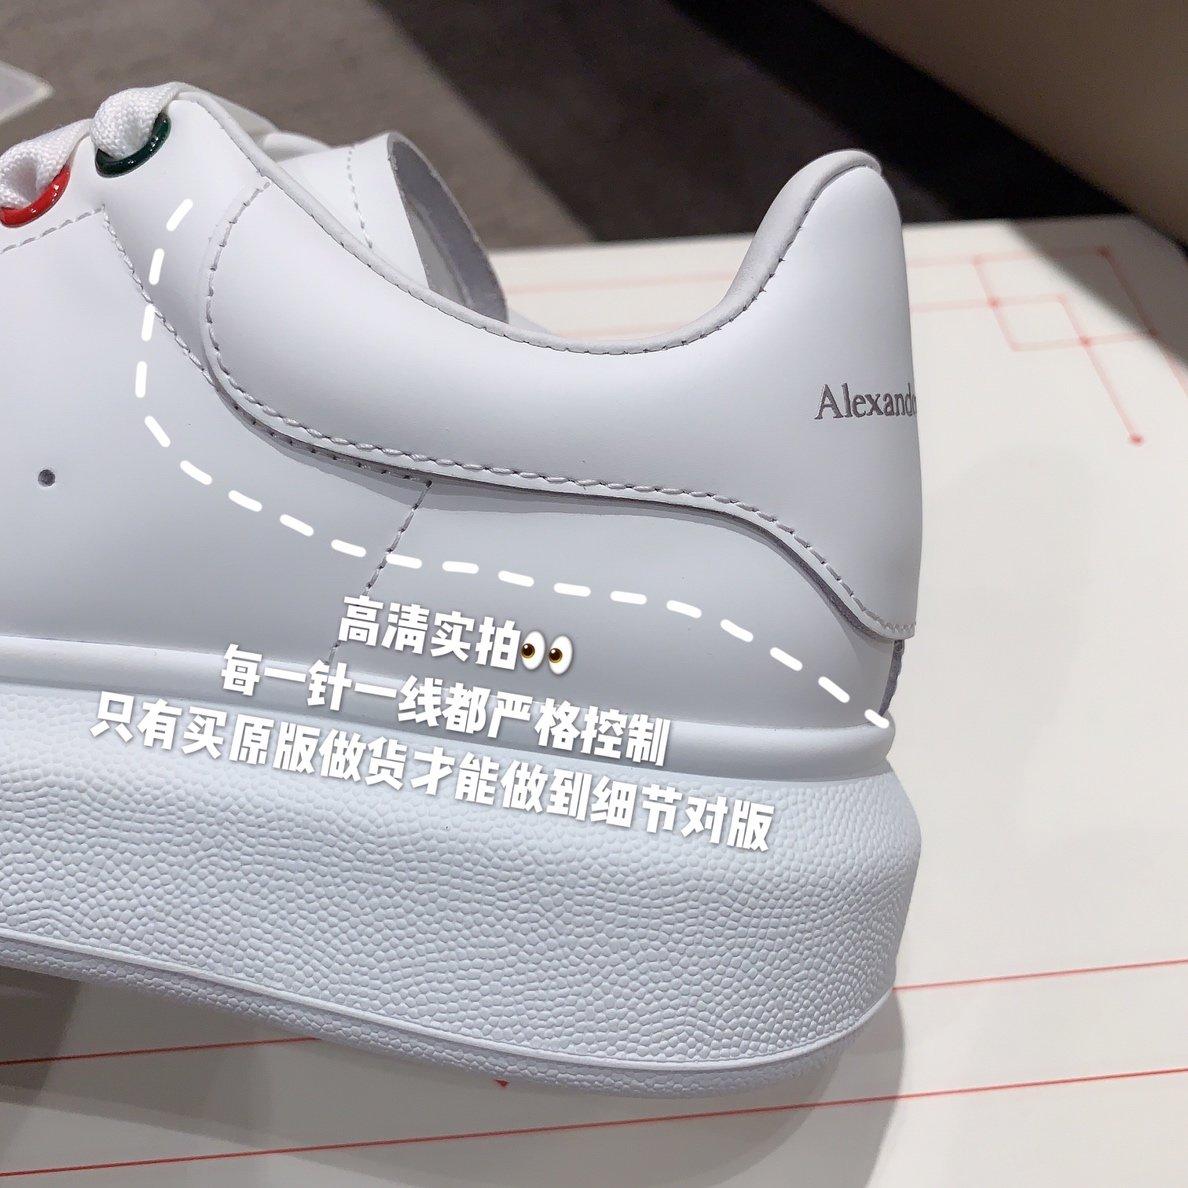 Alexander mcqueen全新升级 小白鞋疯 彩虹系列(图10)